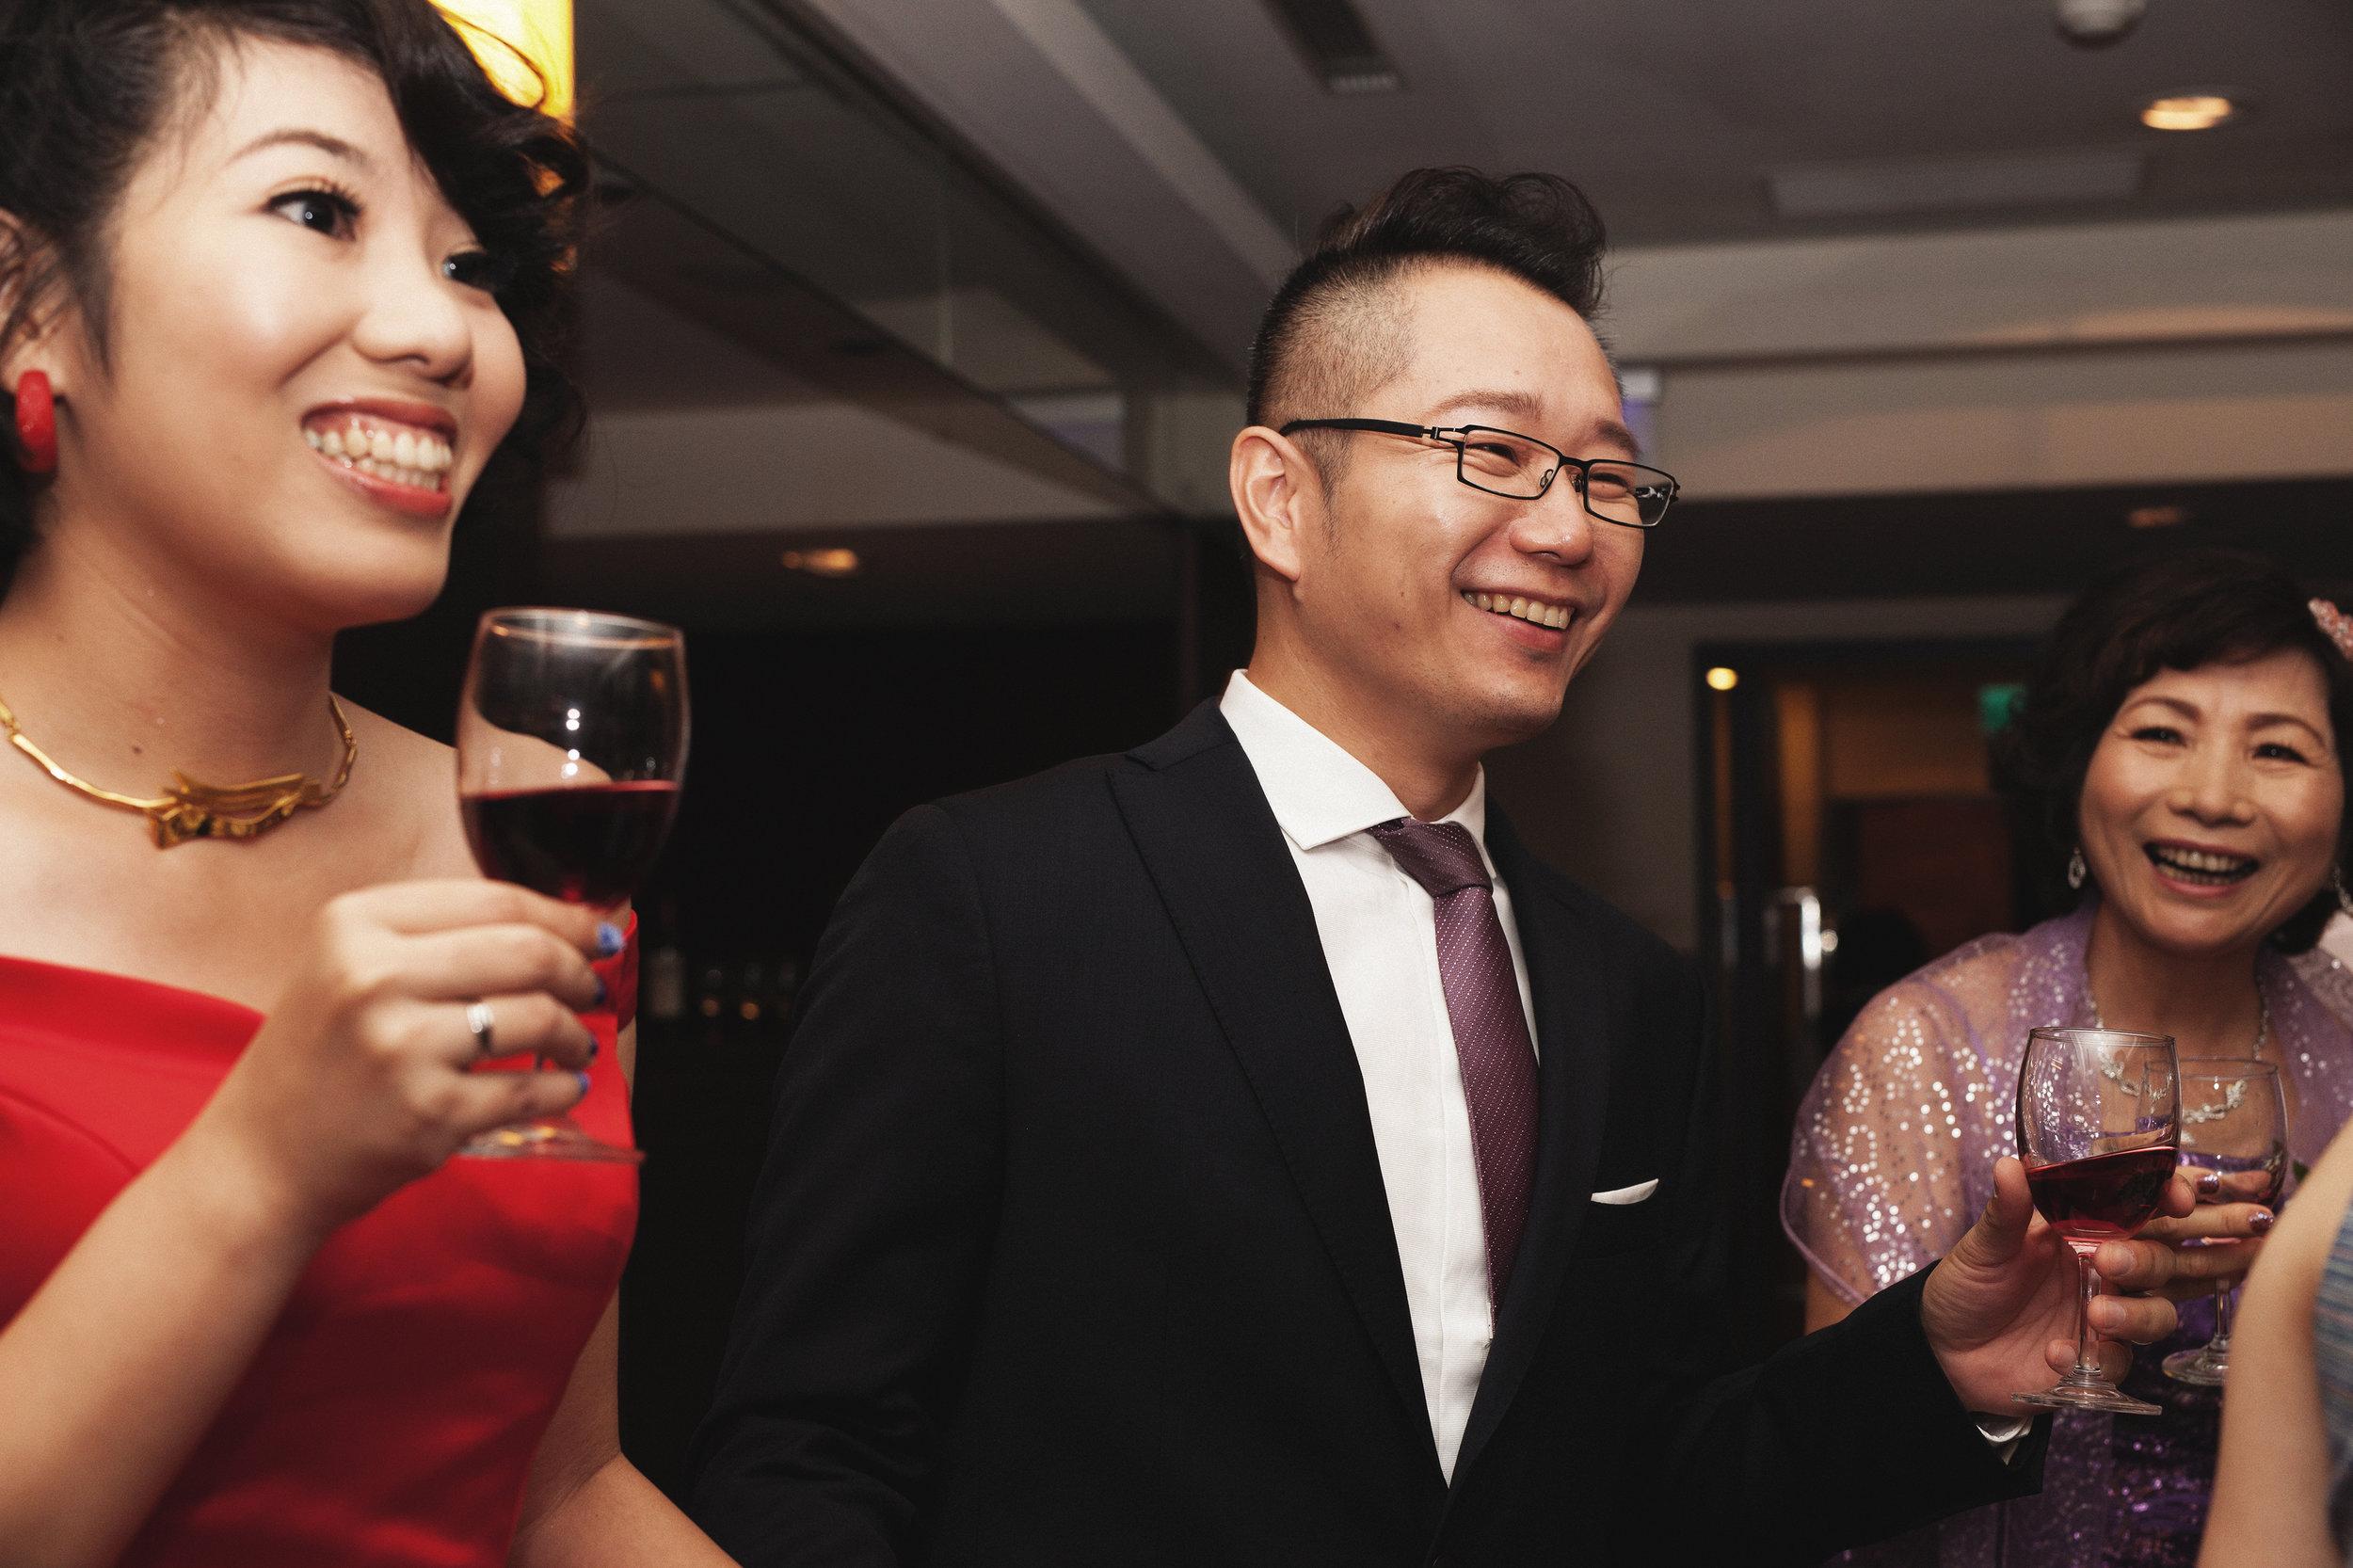 [JC]CREATIVE 女性攝影師 北投儷宴會館 補請台灣WEDDING    自然風格 台北婚攝推 女婚攝  桃園婚攝   圖像00340.JPG